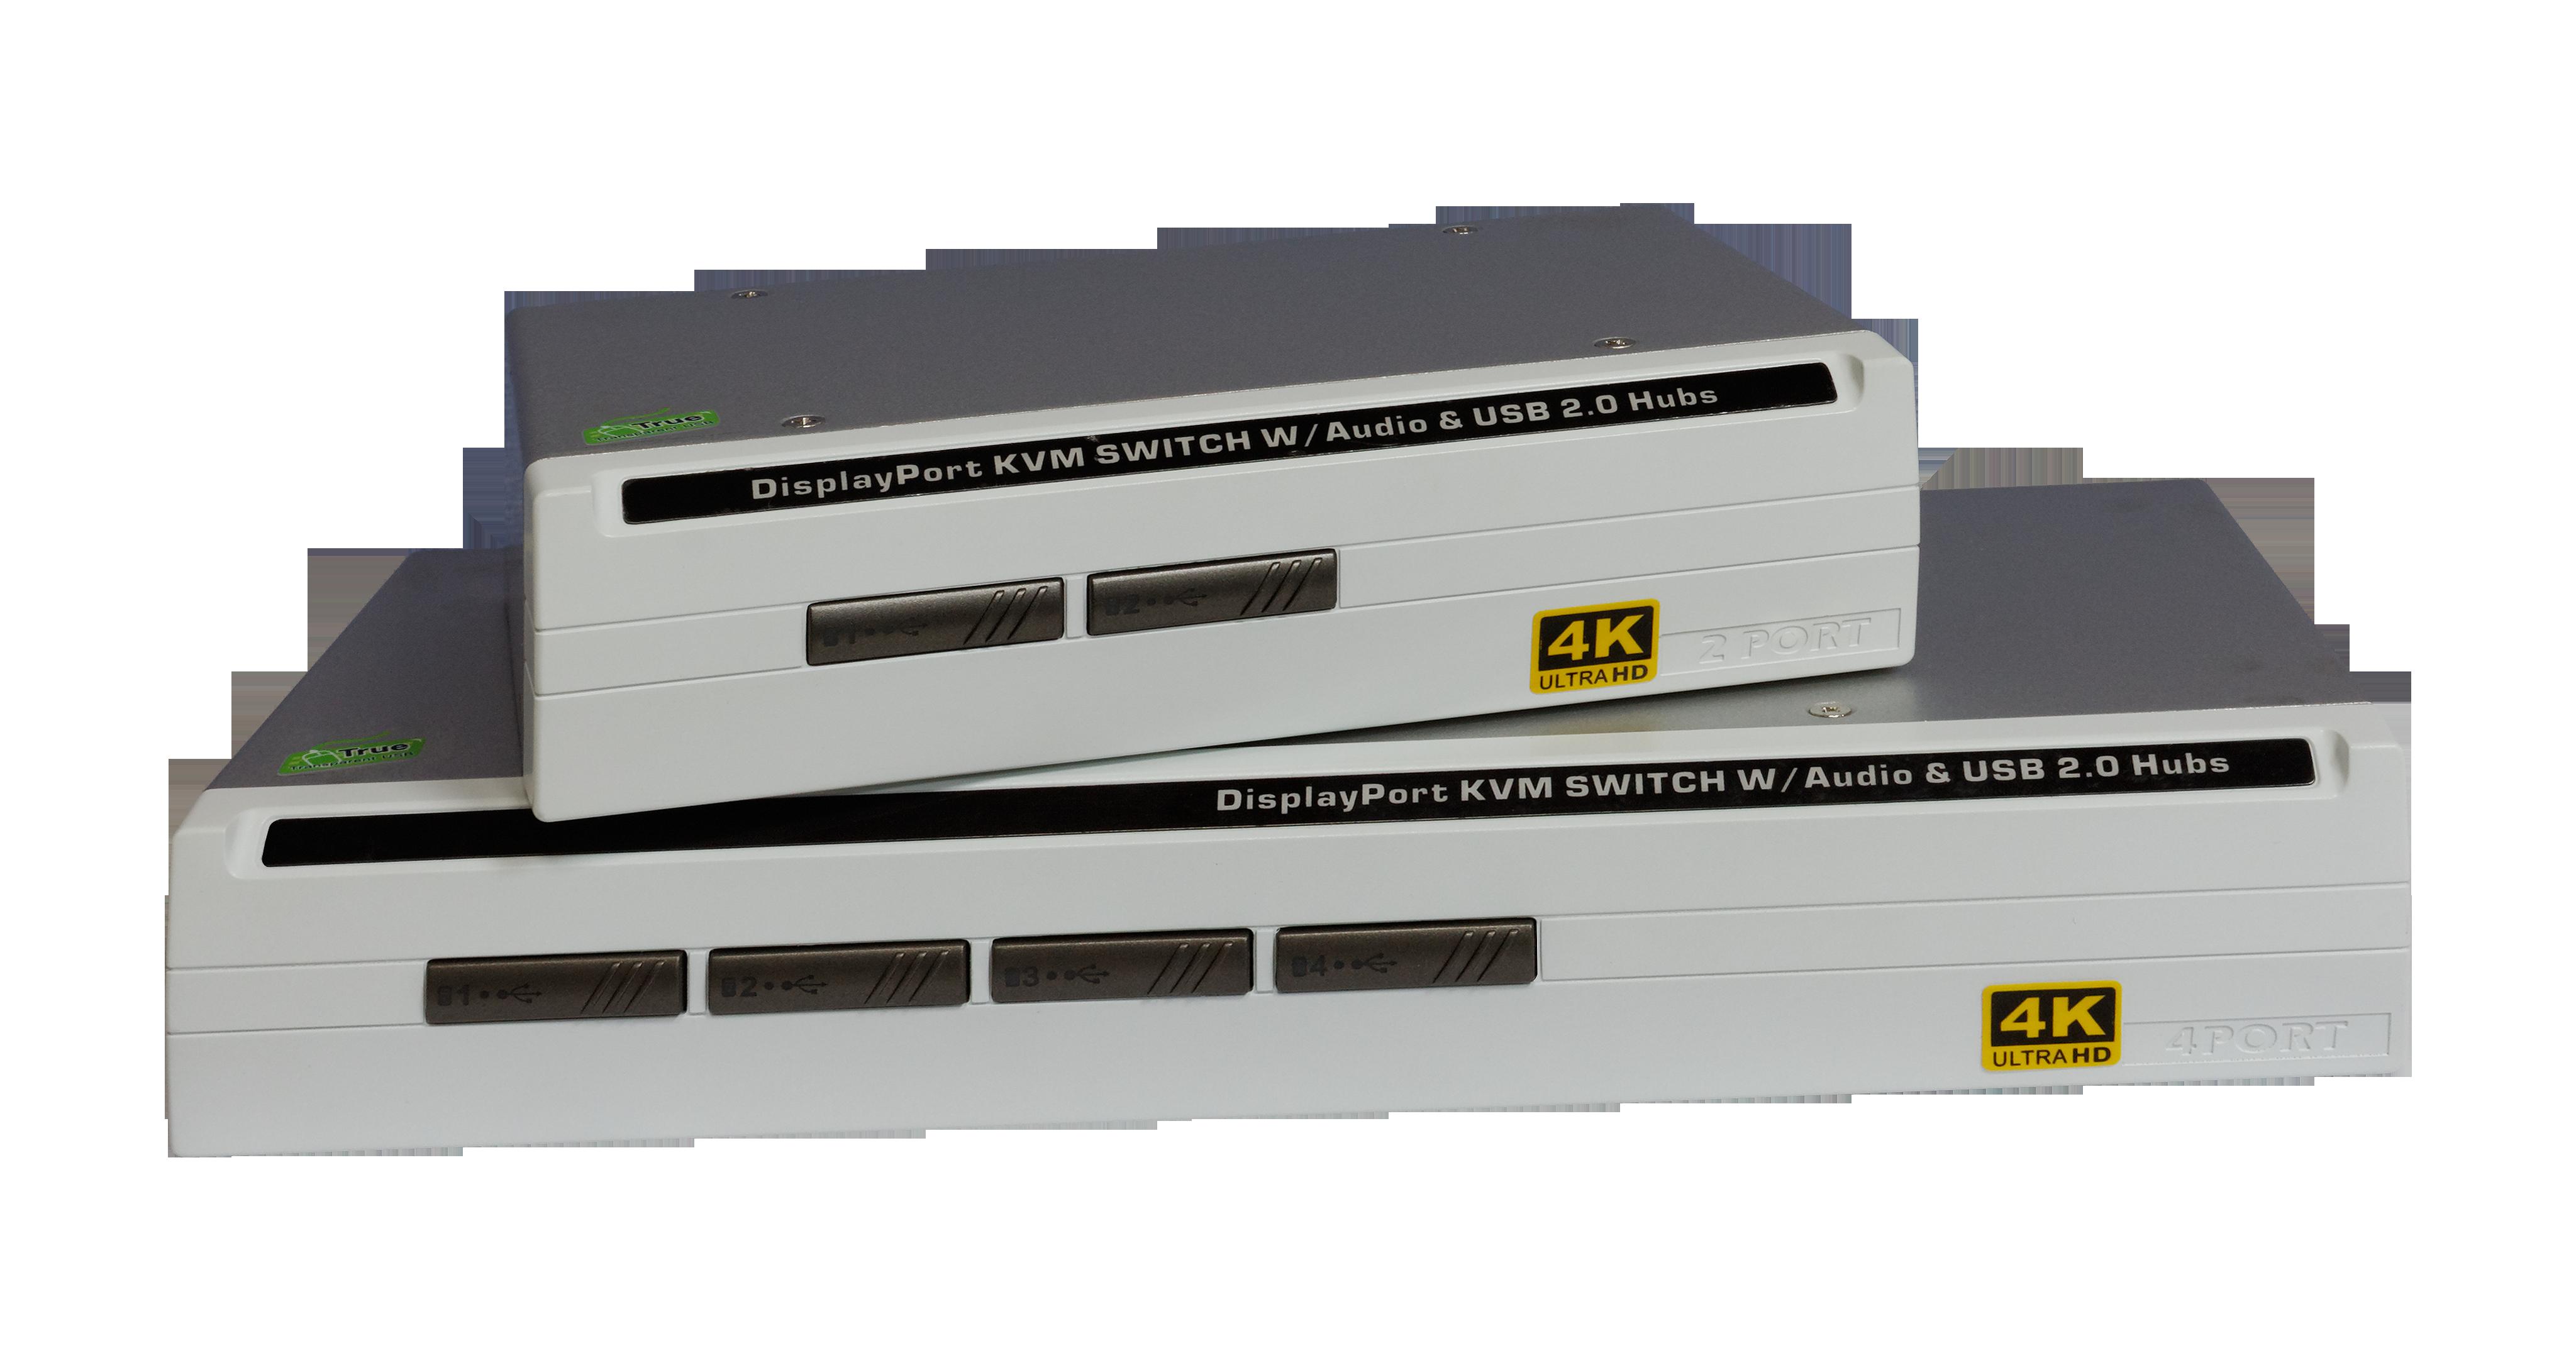 4 port displayport 12 4k 60 hz usb kvm switch with audio usb 20 4 port displayport 12 4k 60 hz usb kvm switch with audio usb 20 publicscrutiny Choice Image